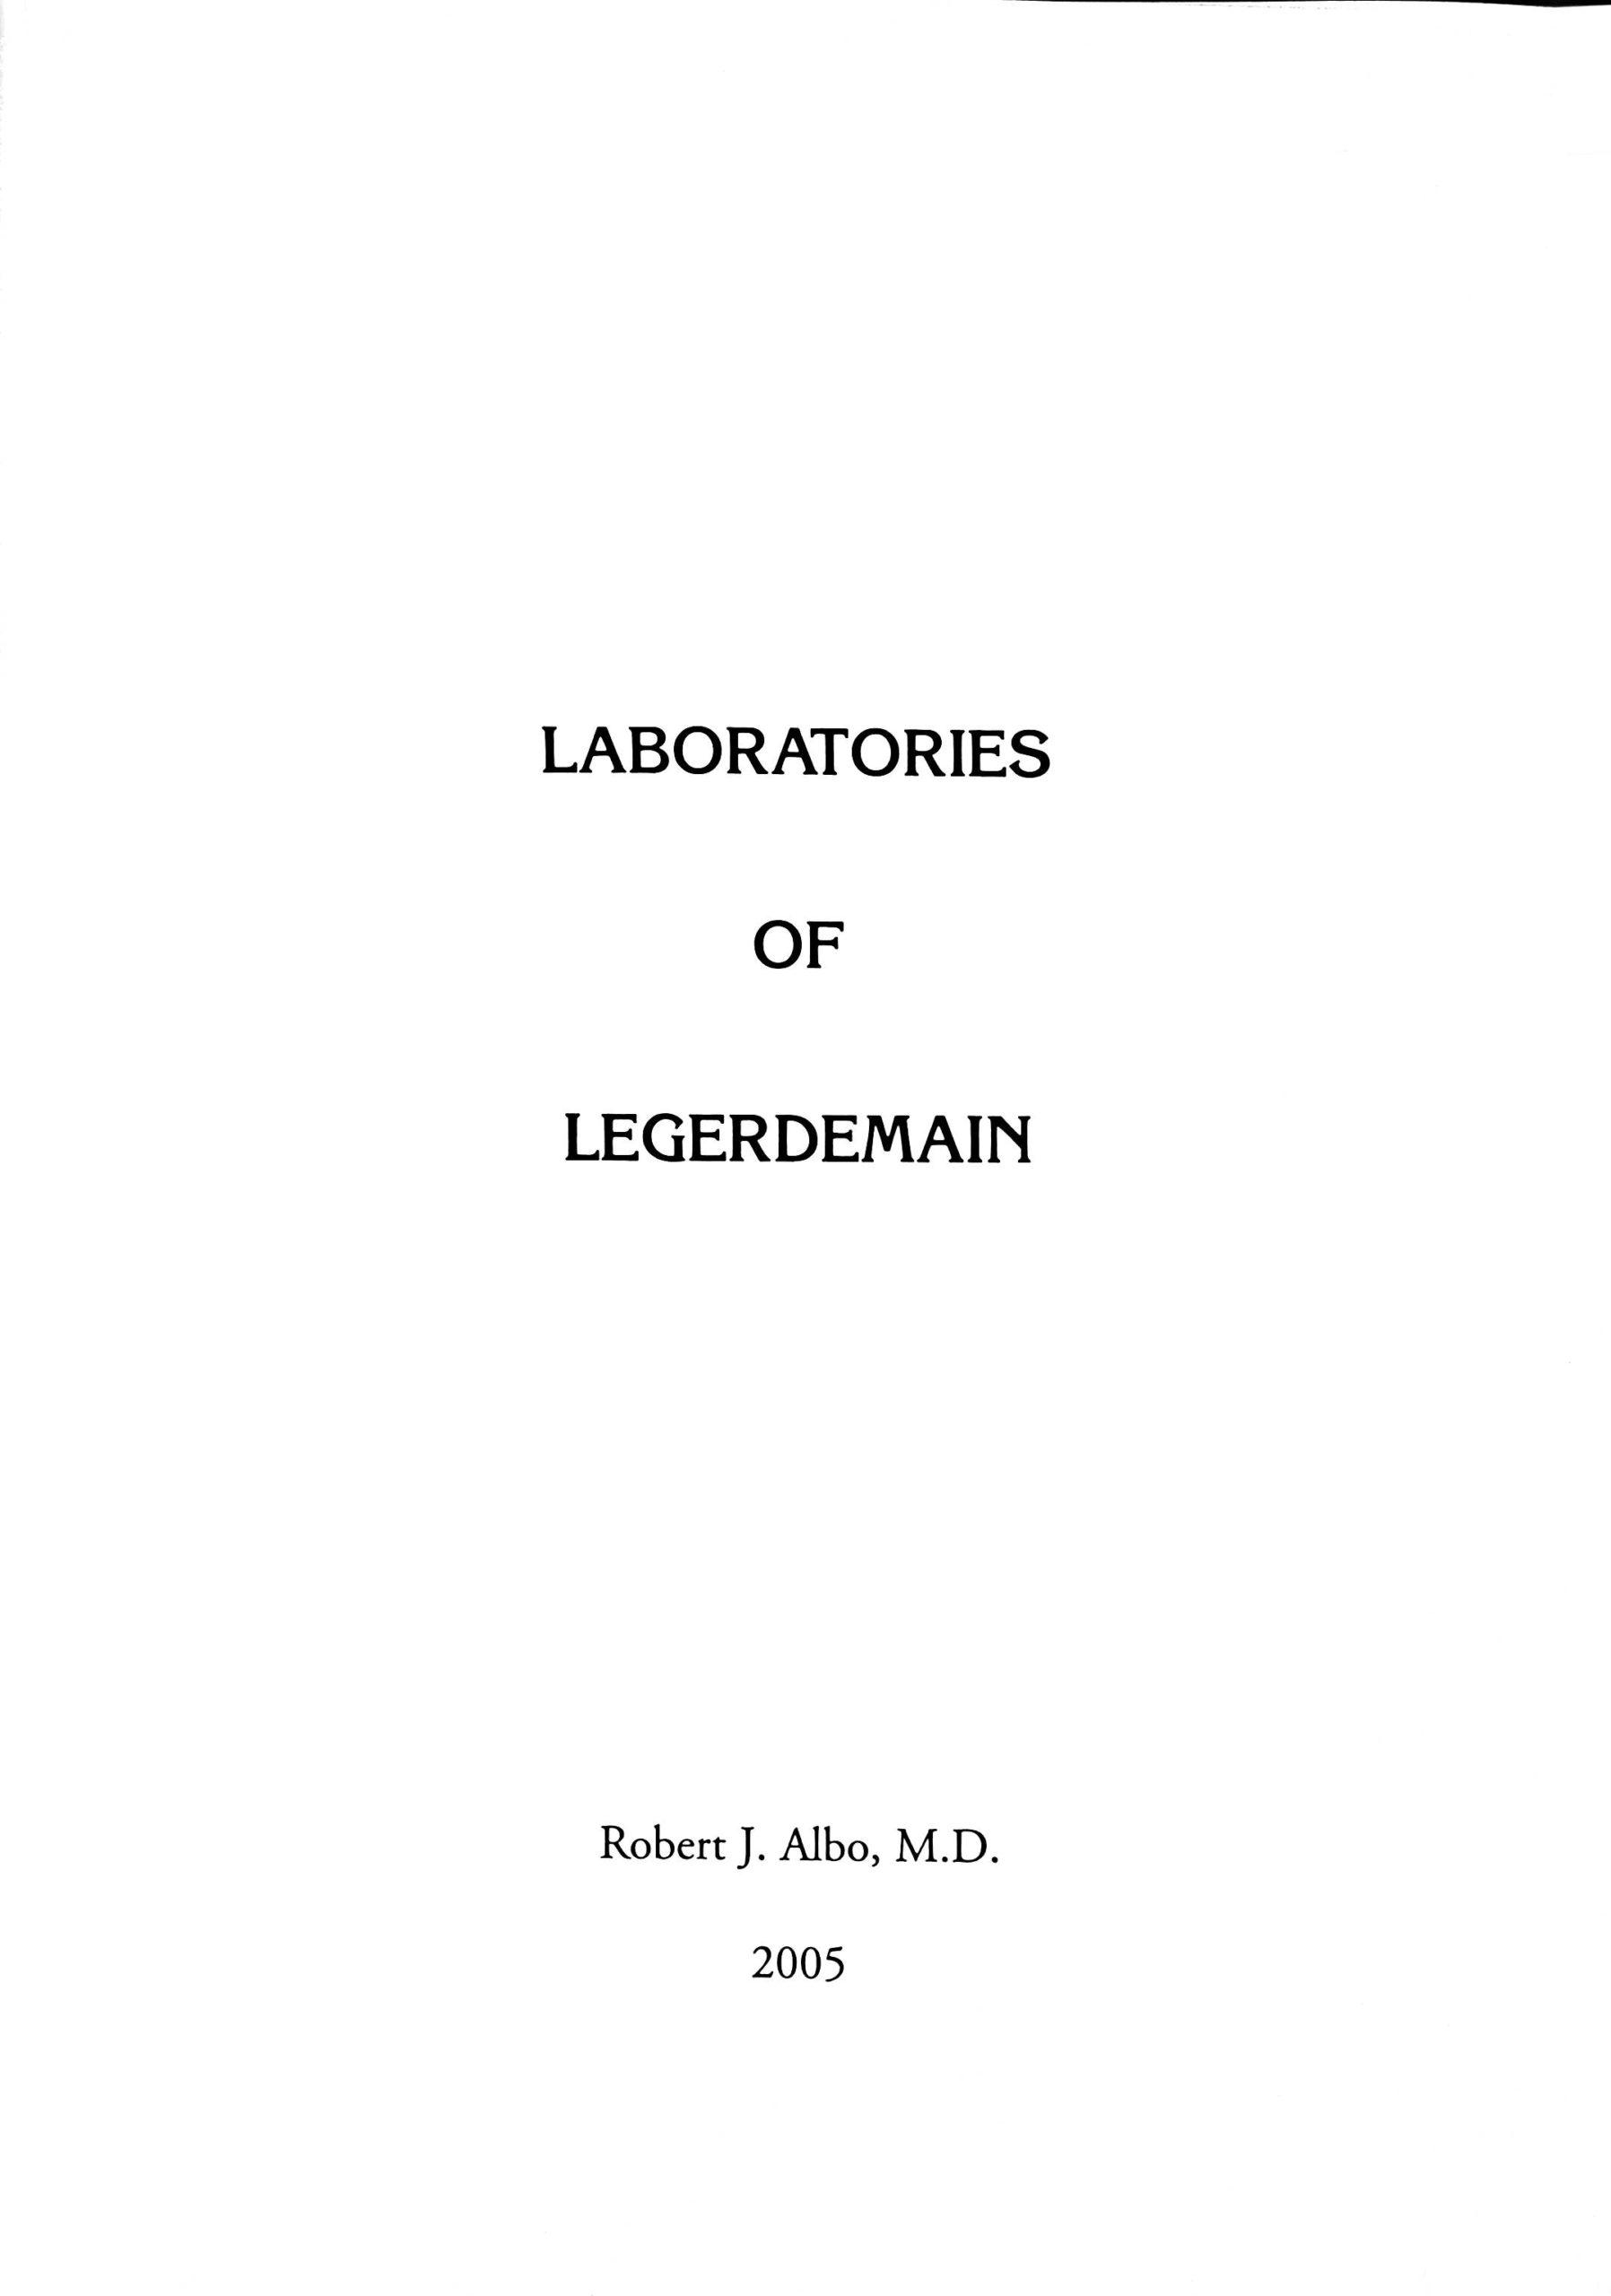 Albo 11 - Laboratories of Legerdemain by Robert J. Albo